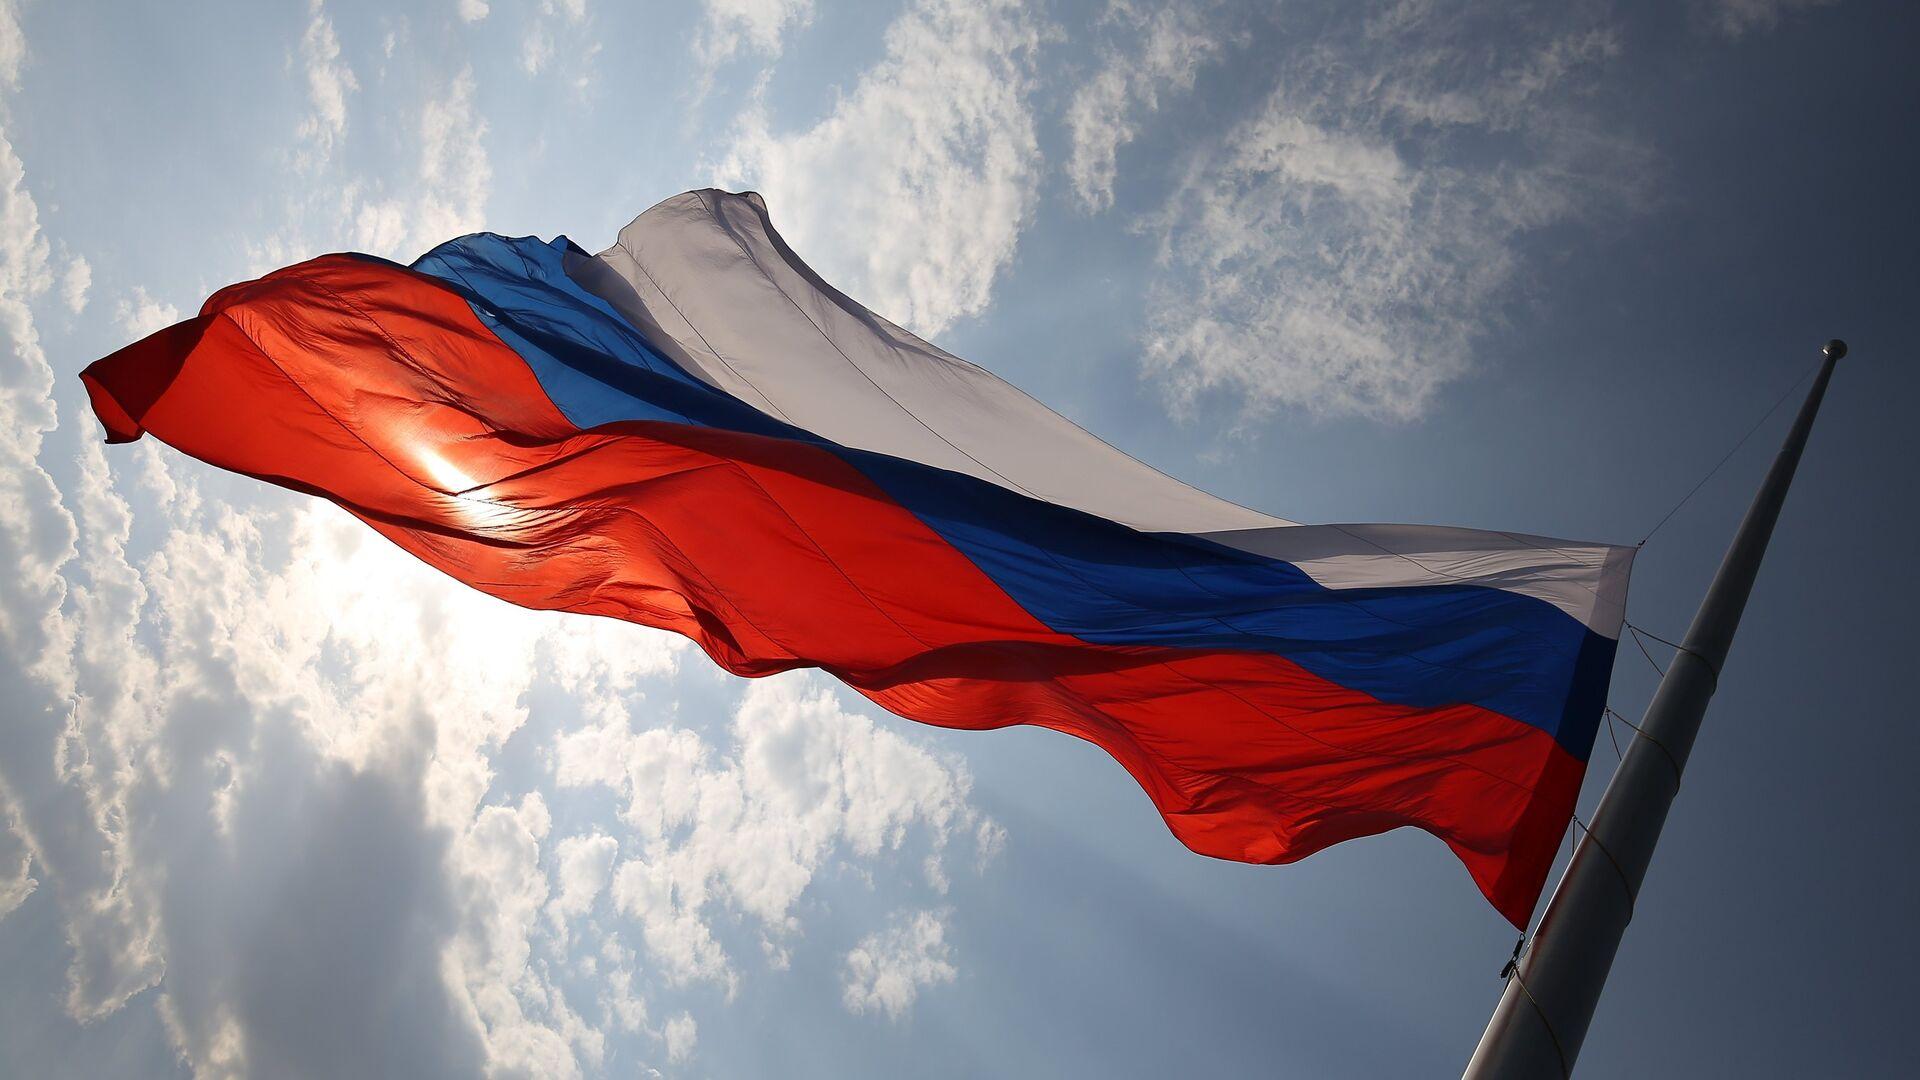 Bandera de Rusia (imagen referencial) - Sputnik Mundo, 1920, 23.02.2021